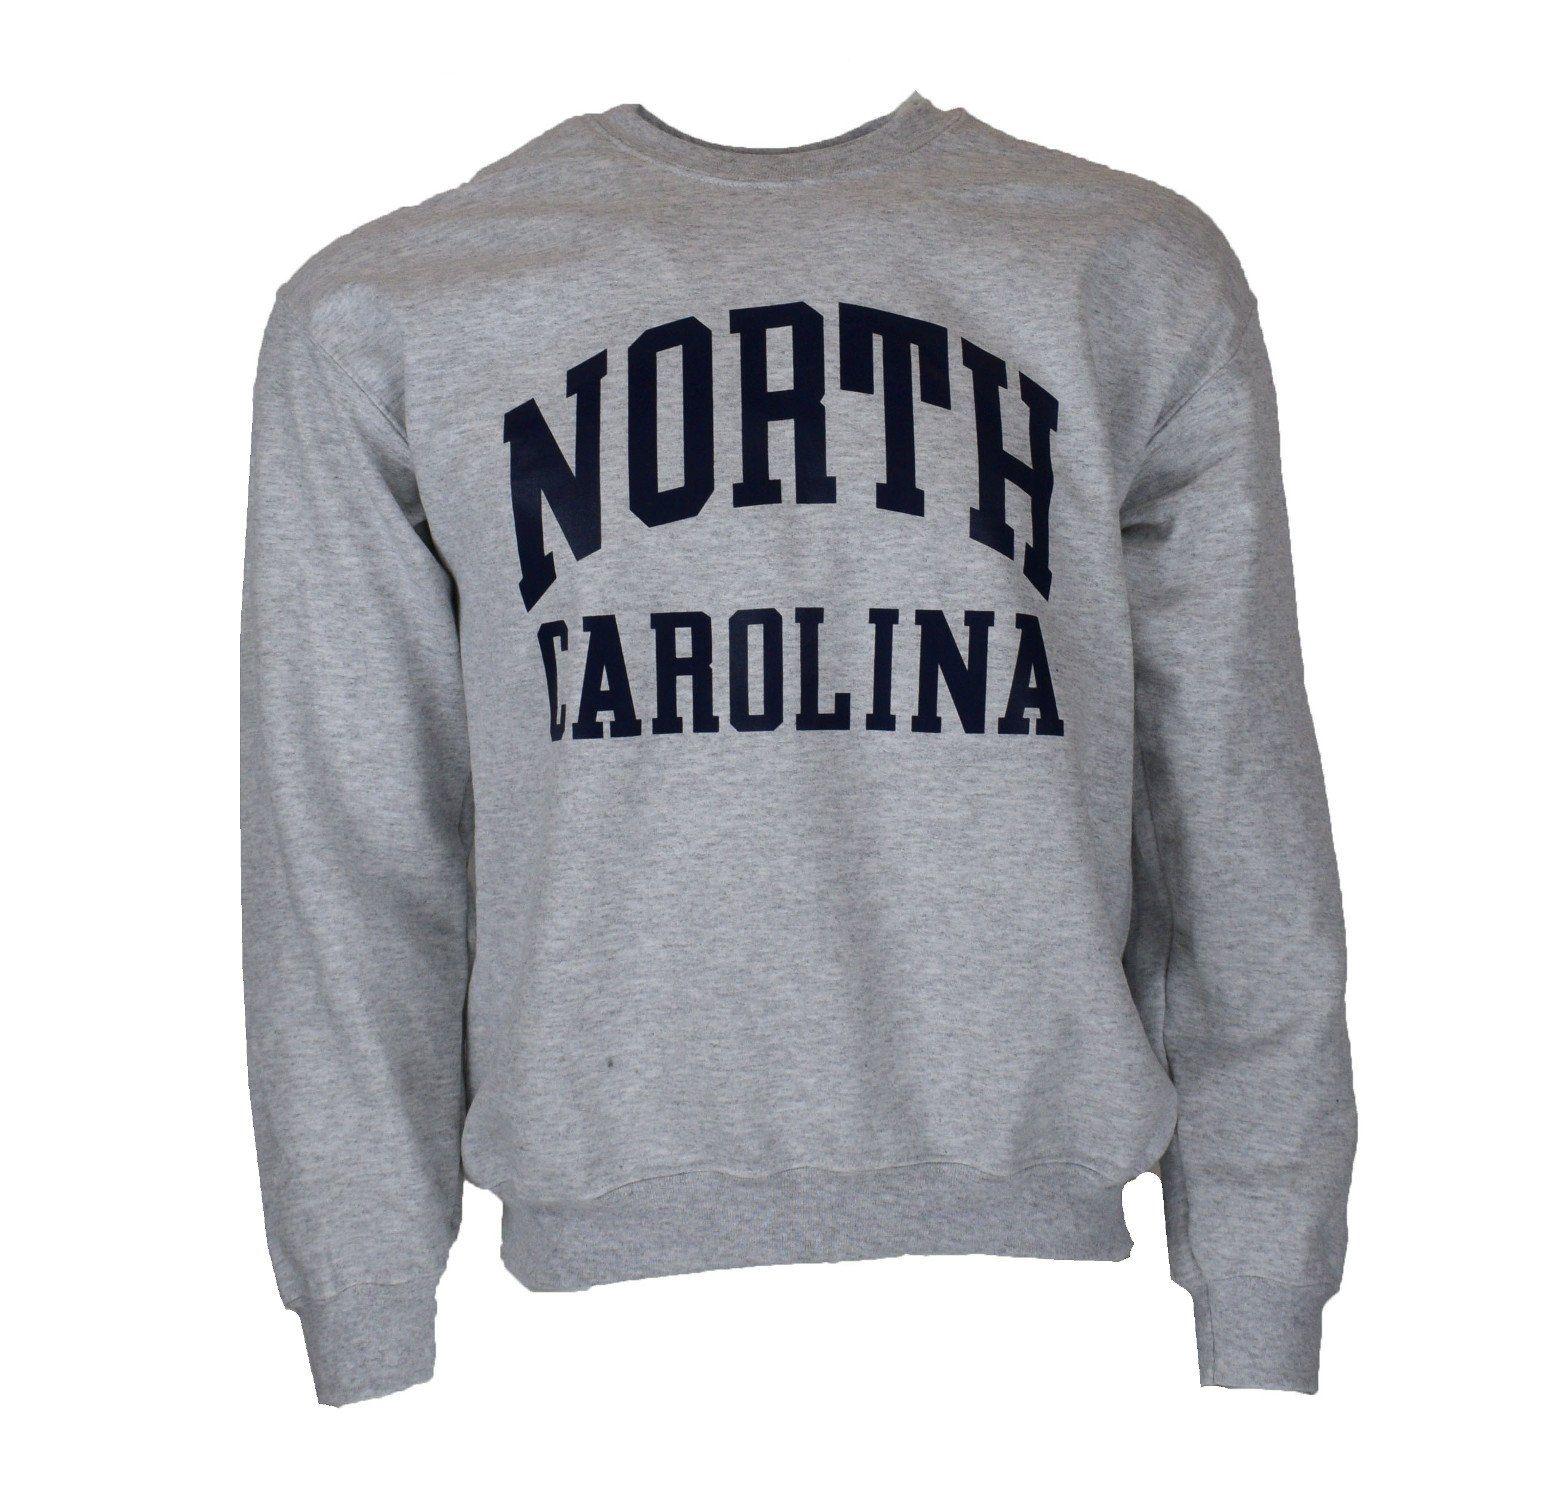 Get Your Classic North Carolina Souvenir Crew Neck Sweatshirt